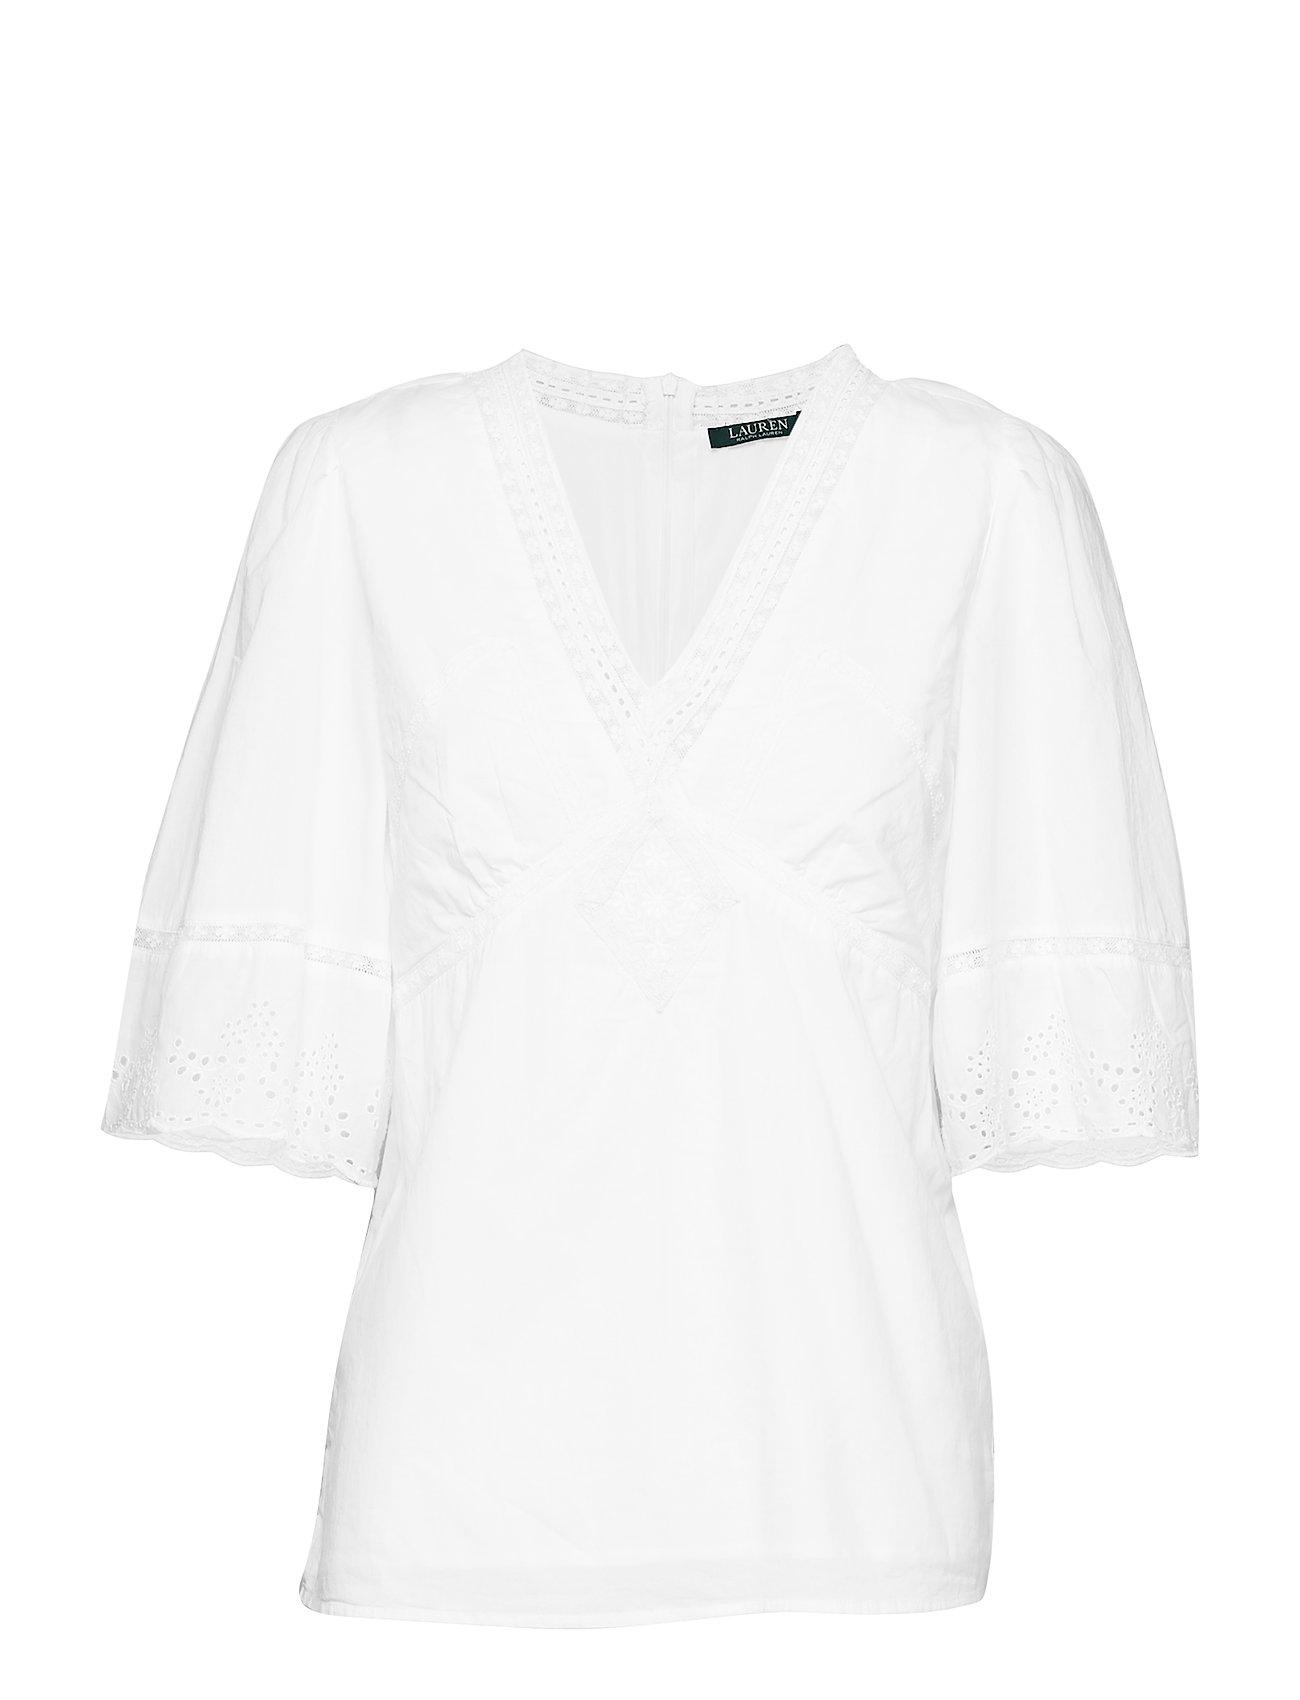 Lauren Ralph Lauren Eyelet-Trim Cotton Top - WHITE